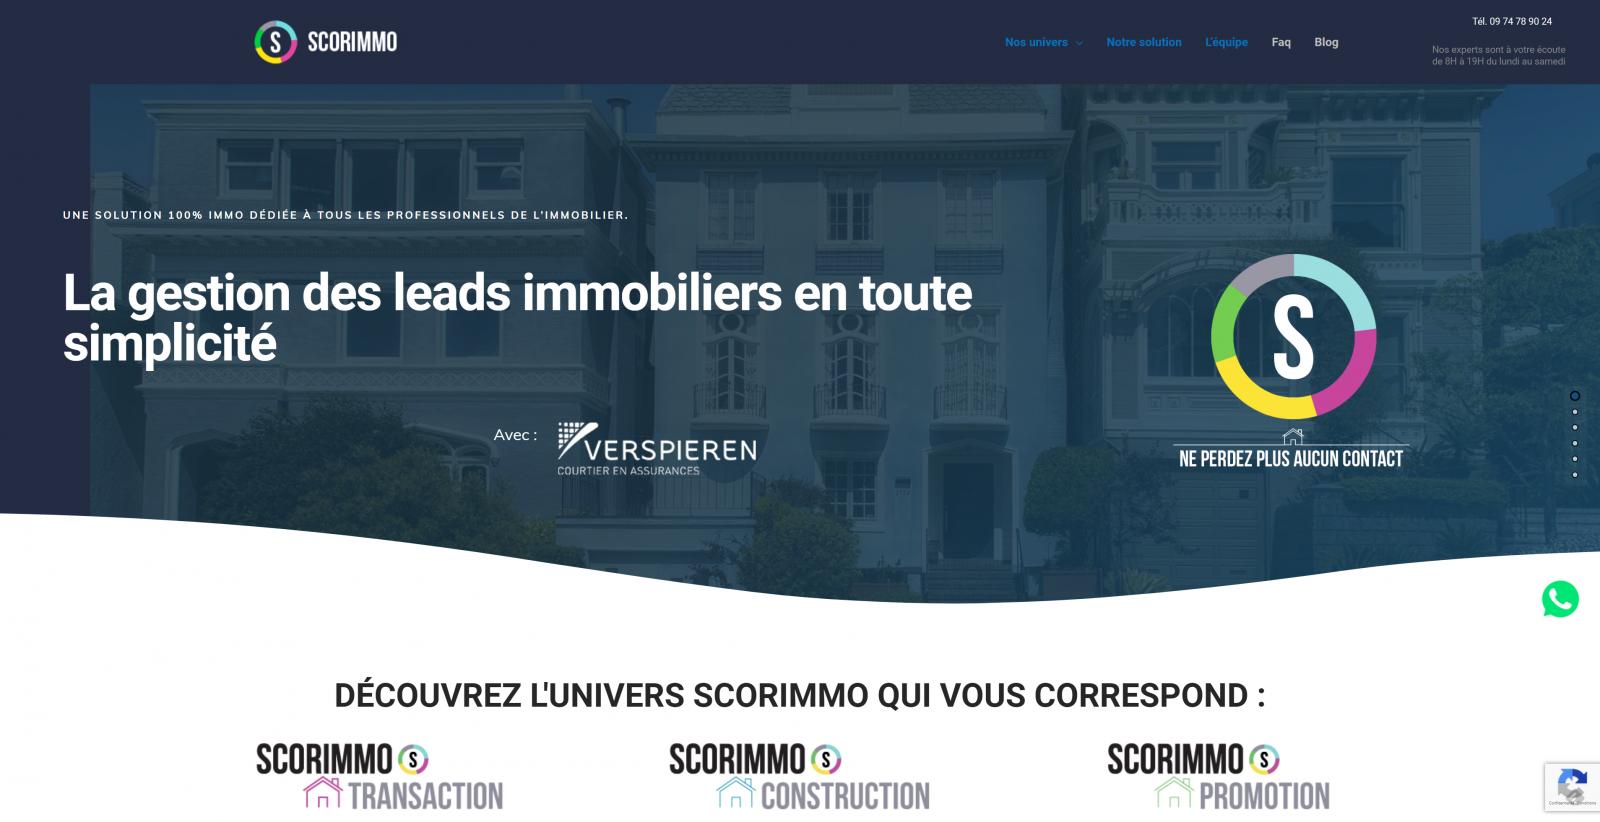 Scorimmo Gestion Des Leads Immobiliers